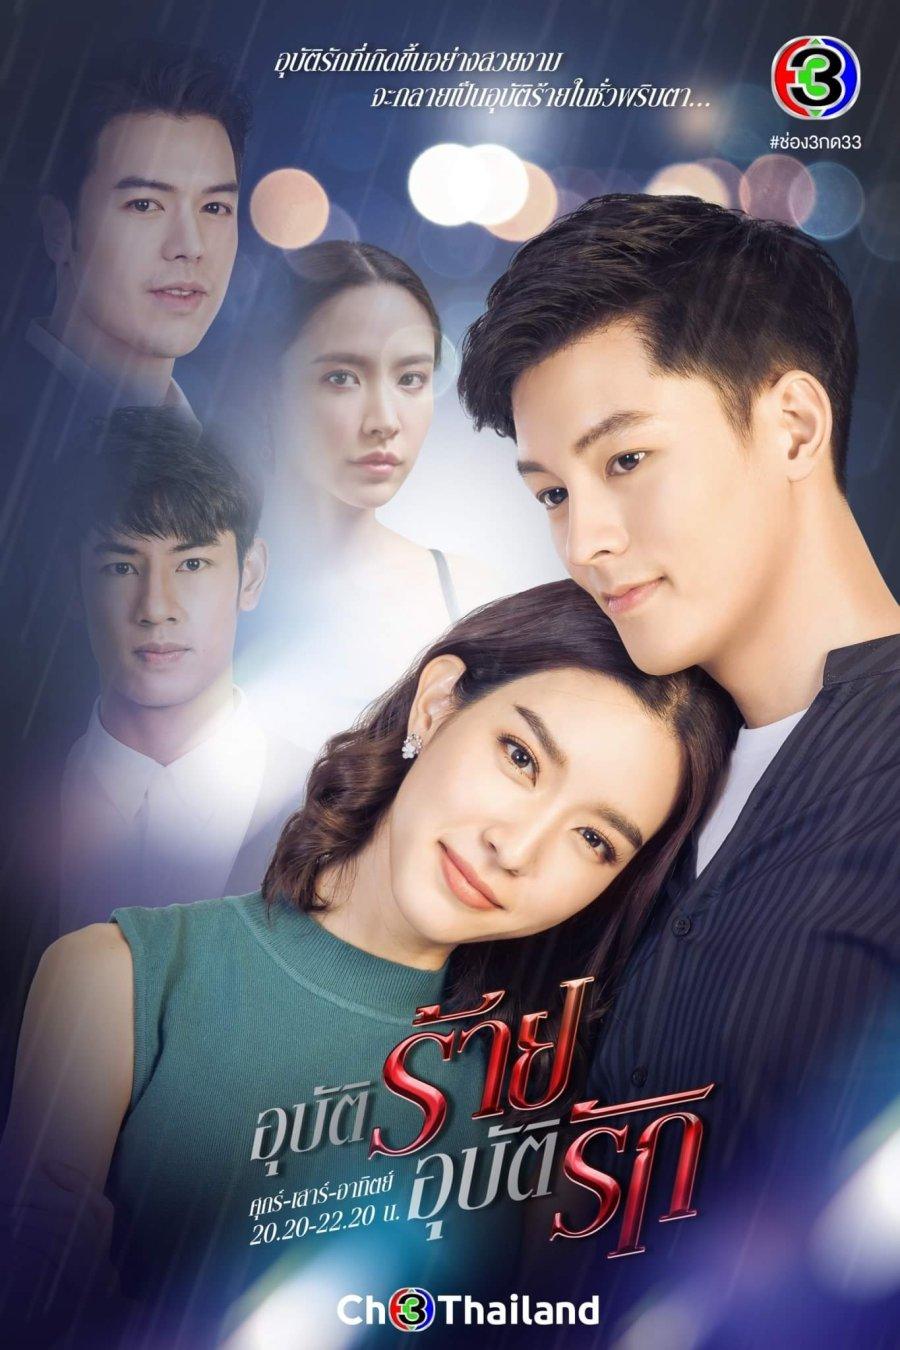 ZXeAJ 4f - Авария любви ✦ 2021 ✦ Таиланд